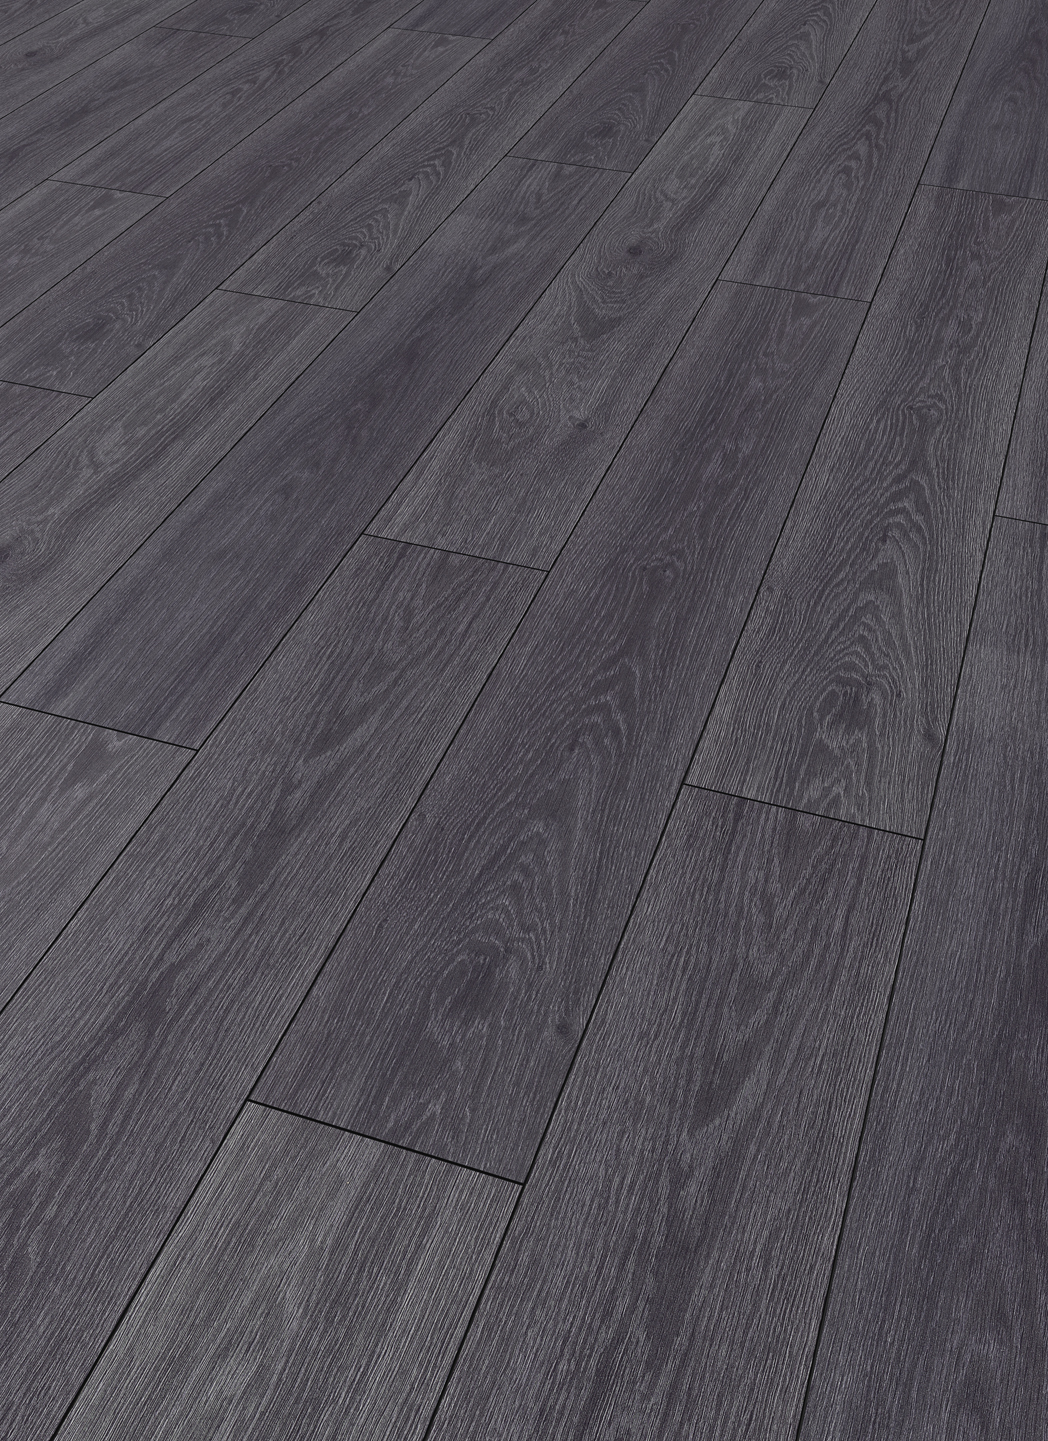 terh rne avatara floor eiche schwarzgrau 1 stab c08. Black Bedroom Furniture Sets. Home Design Ideas